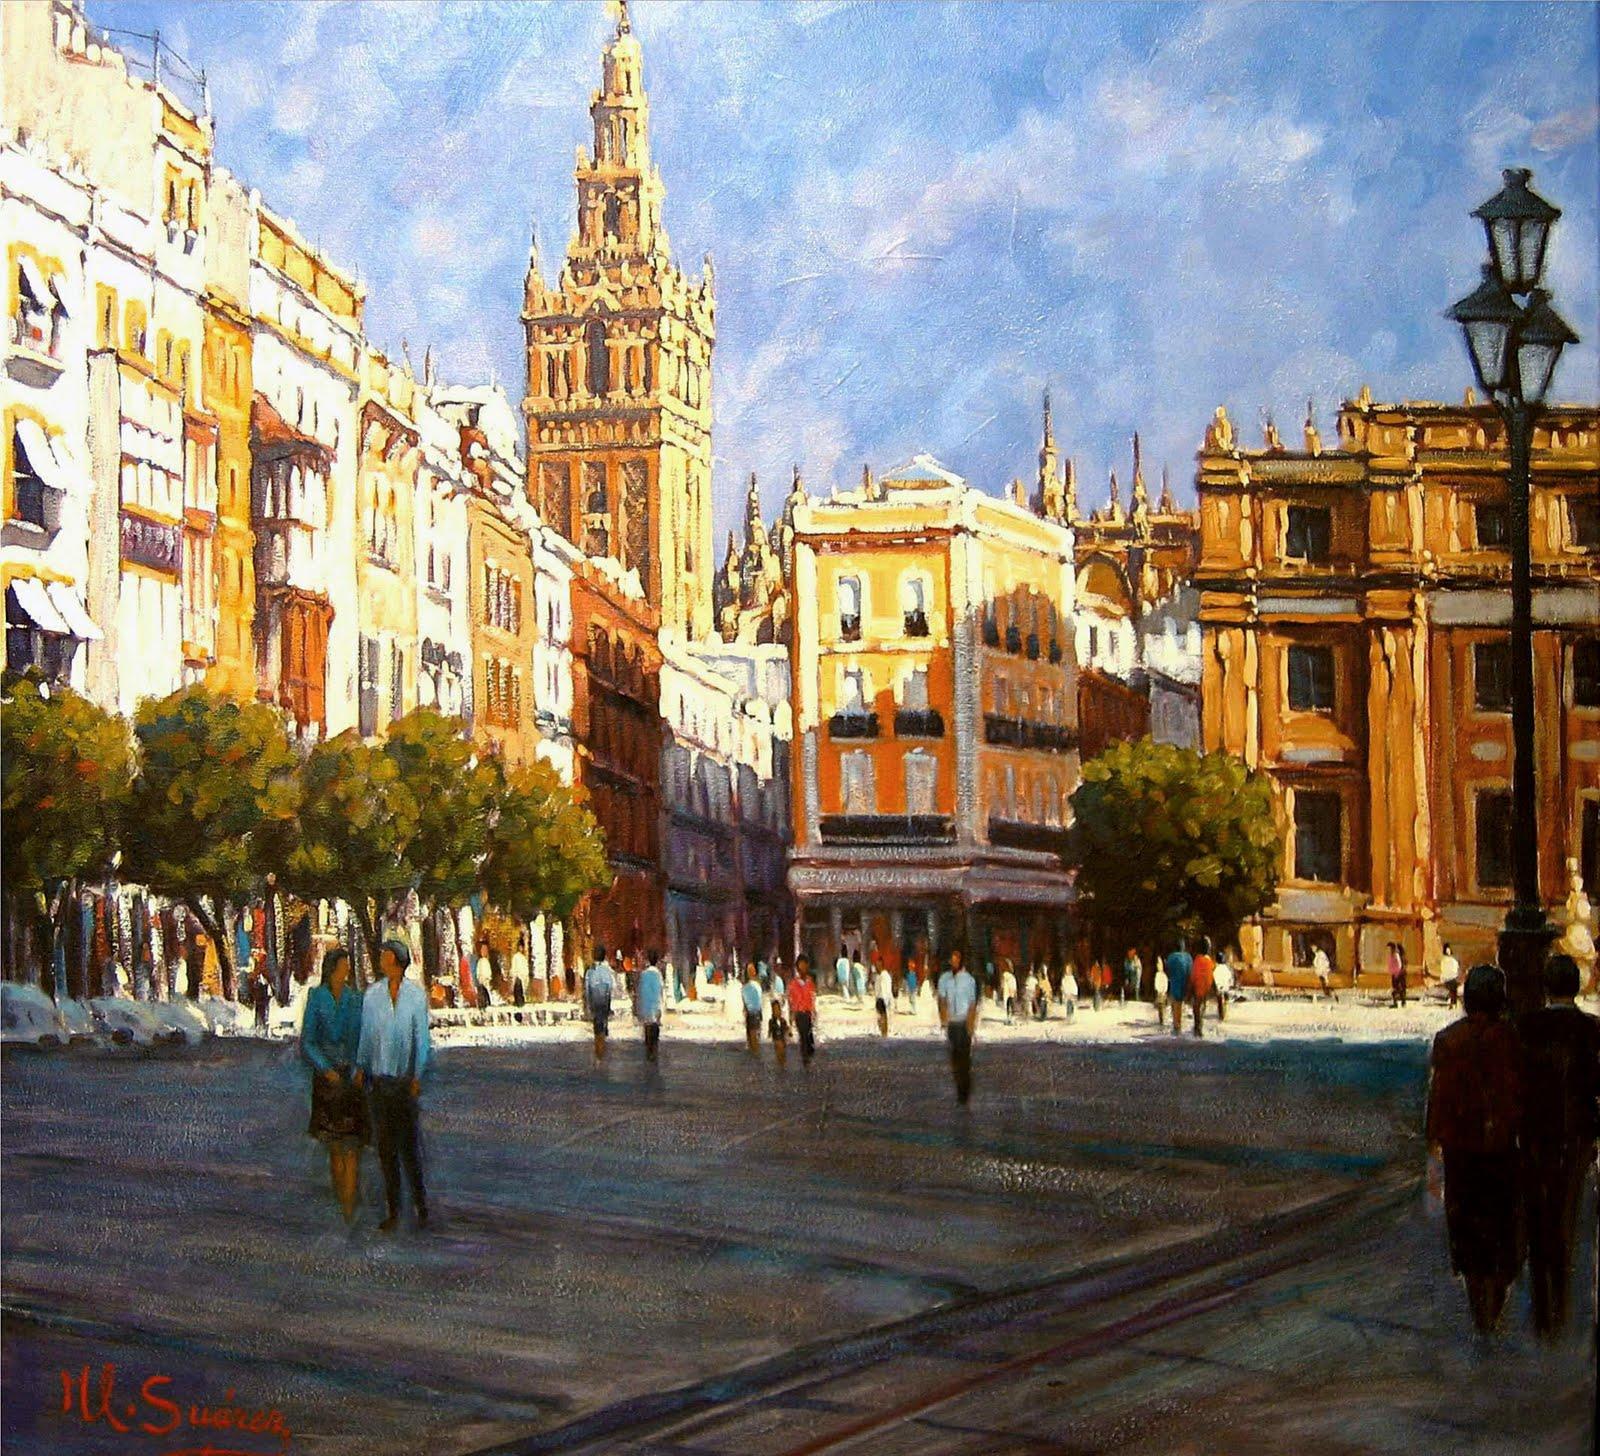 Galeria jlsuarez sevilla plaza san francisco paisajes for Todo pintura sevilla